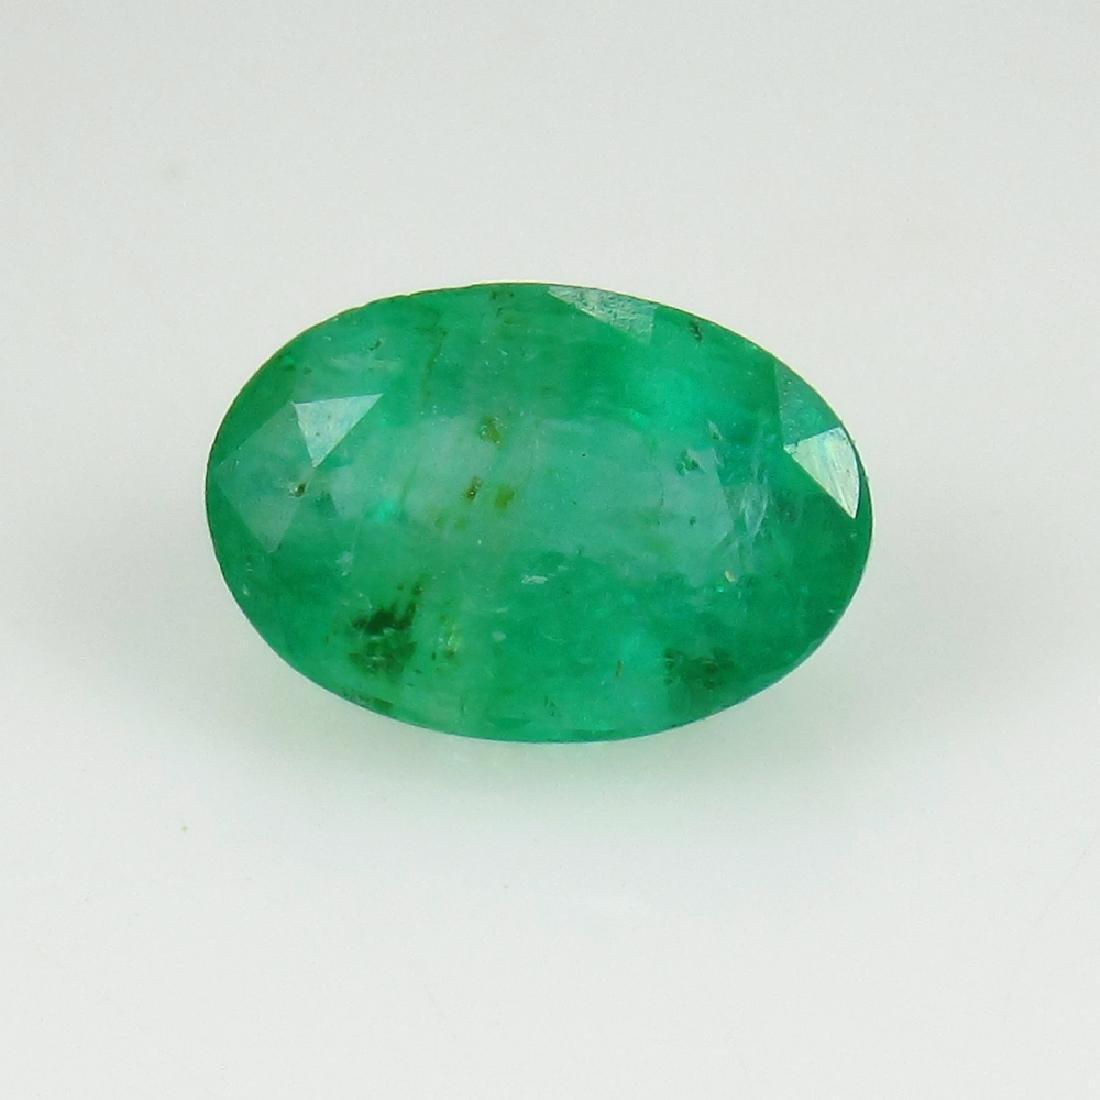 2.06 Ct IGI Certified Genuine Zambian Emerald Nice Oval